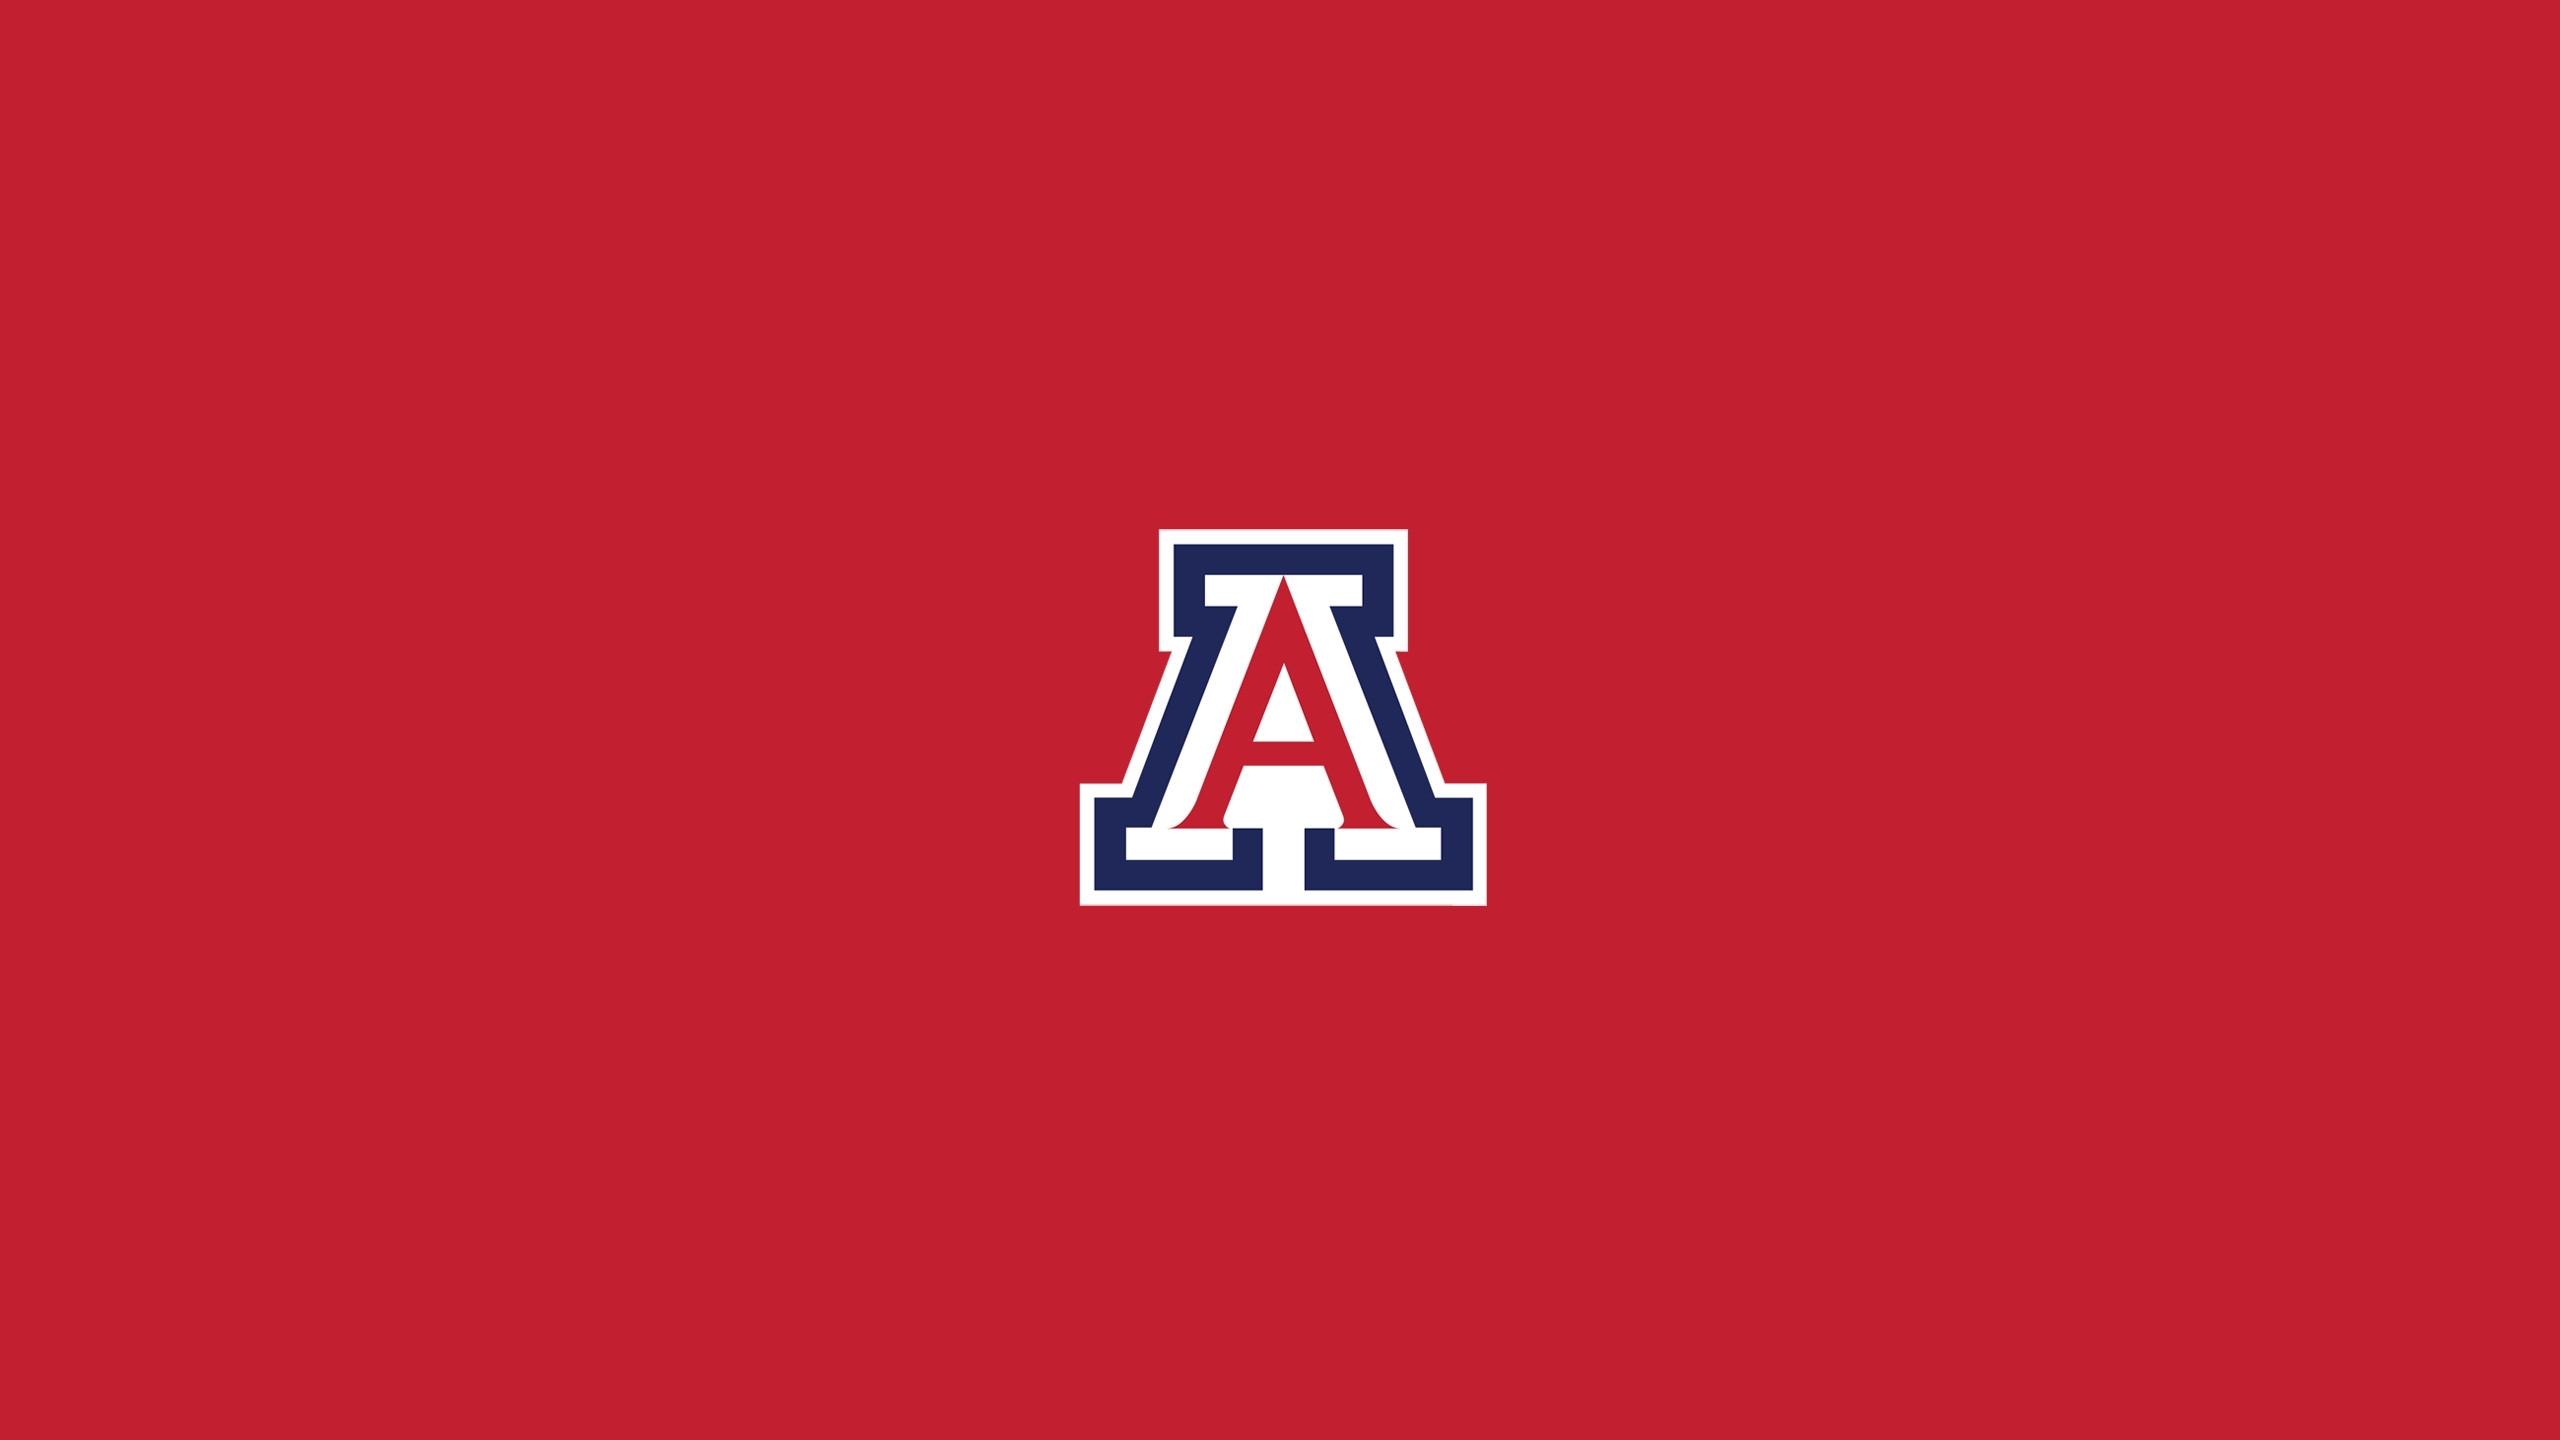 university of arizona wildcats logo wallpaper background 62471